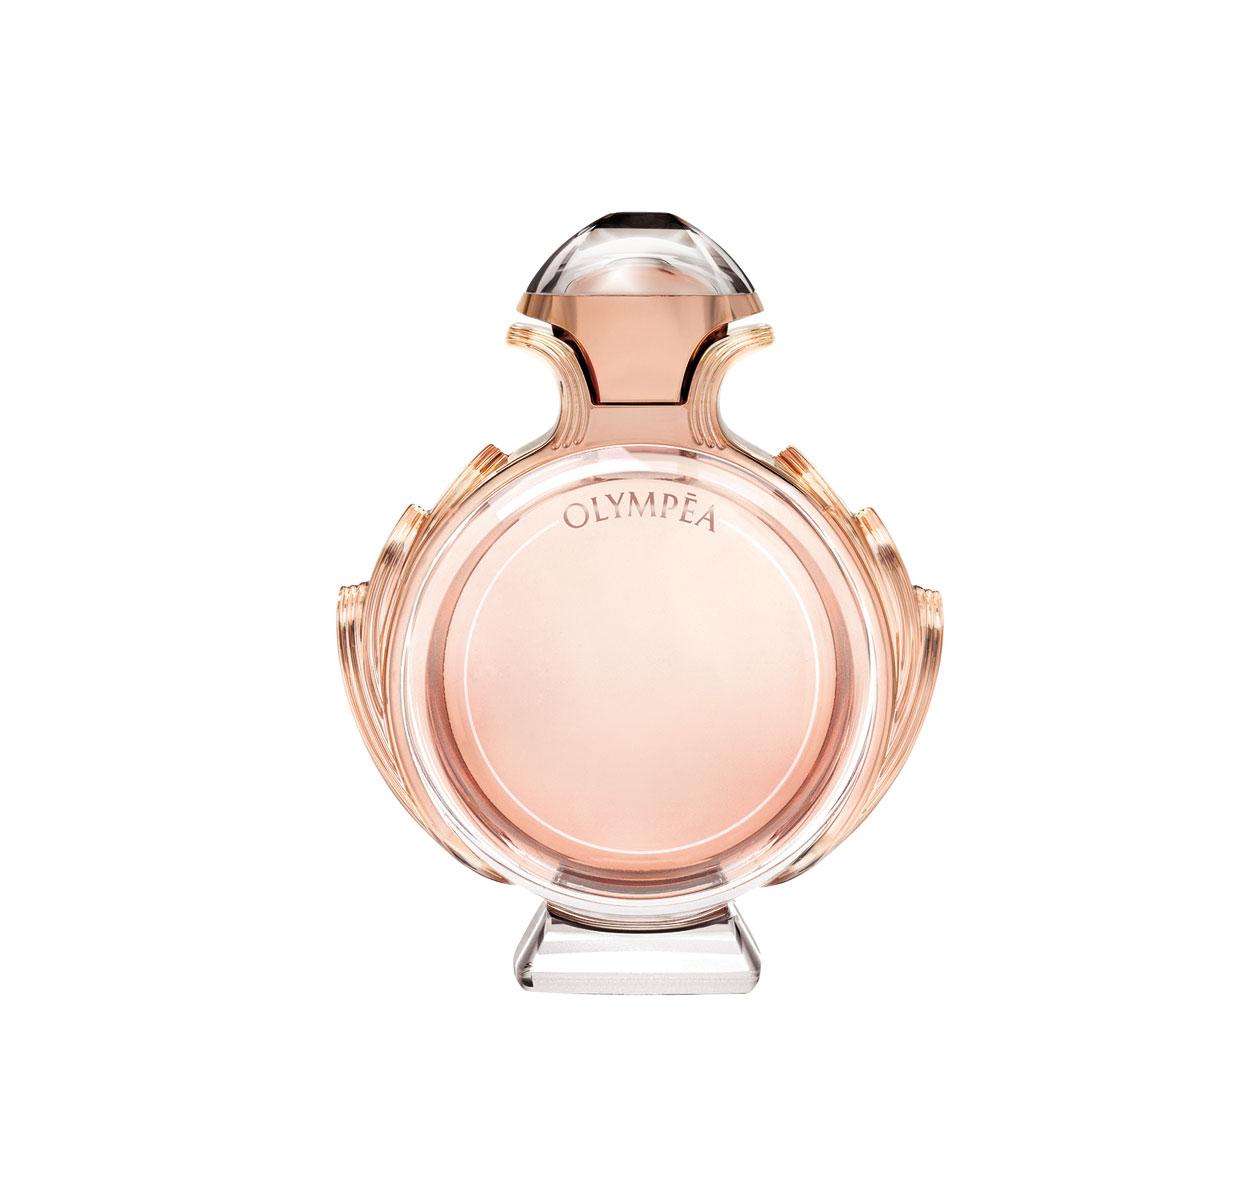 Olympéa, Paco Rabanne. Eau de parfum 80 ml, PVPR 97 €.